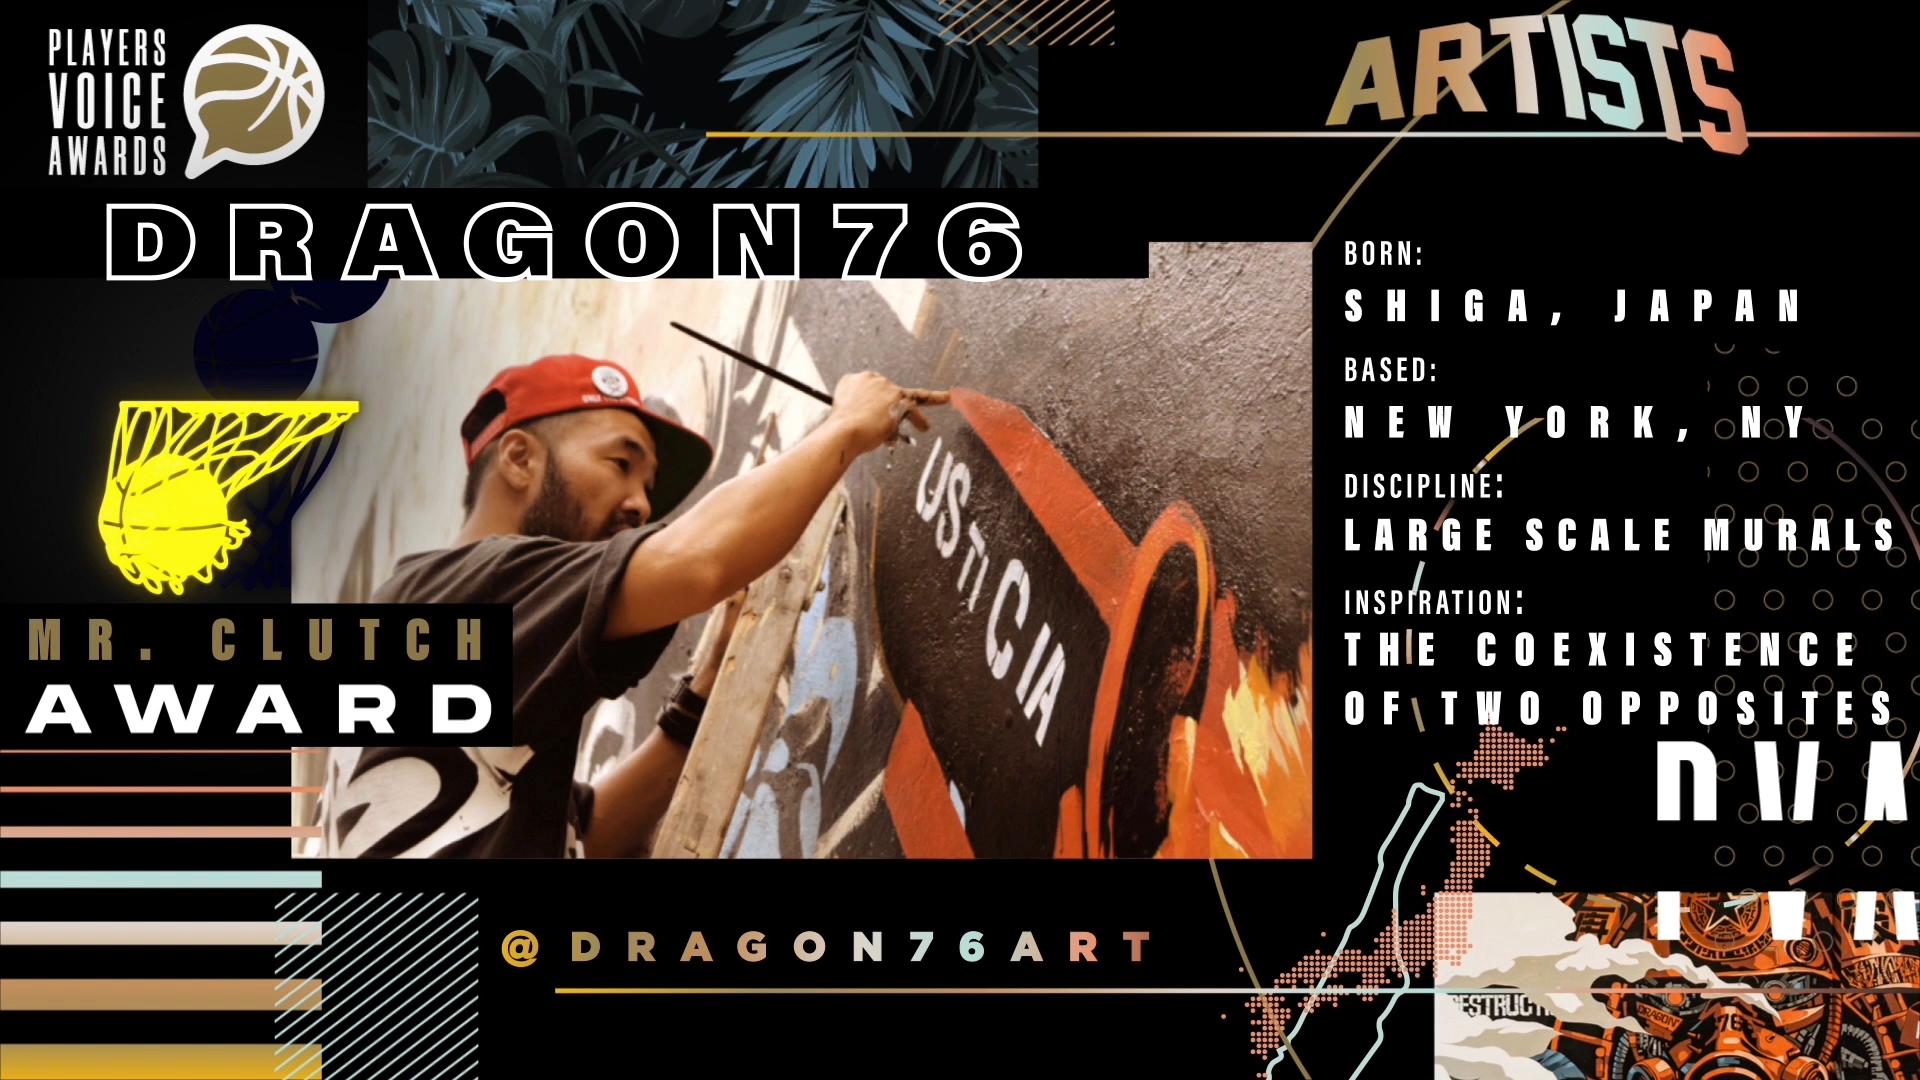 Dragon76